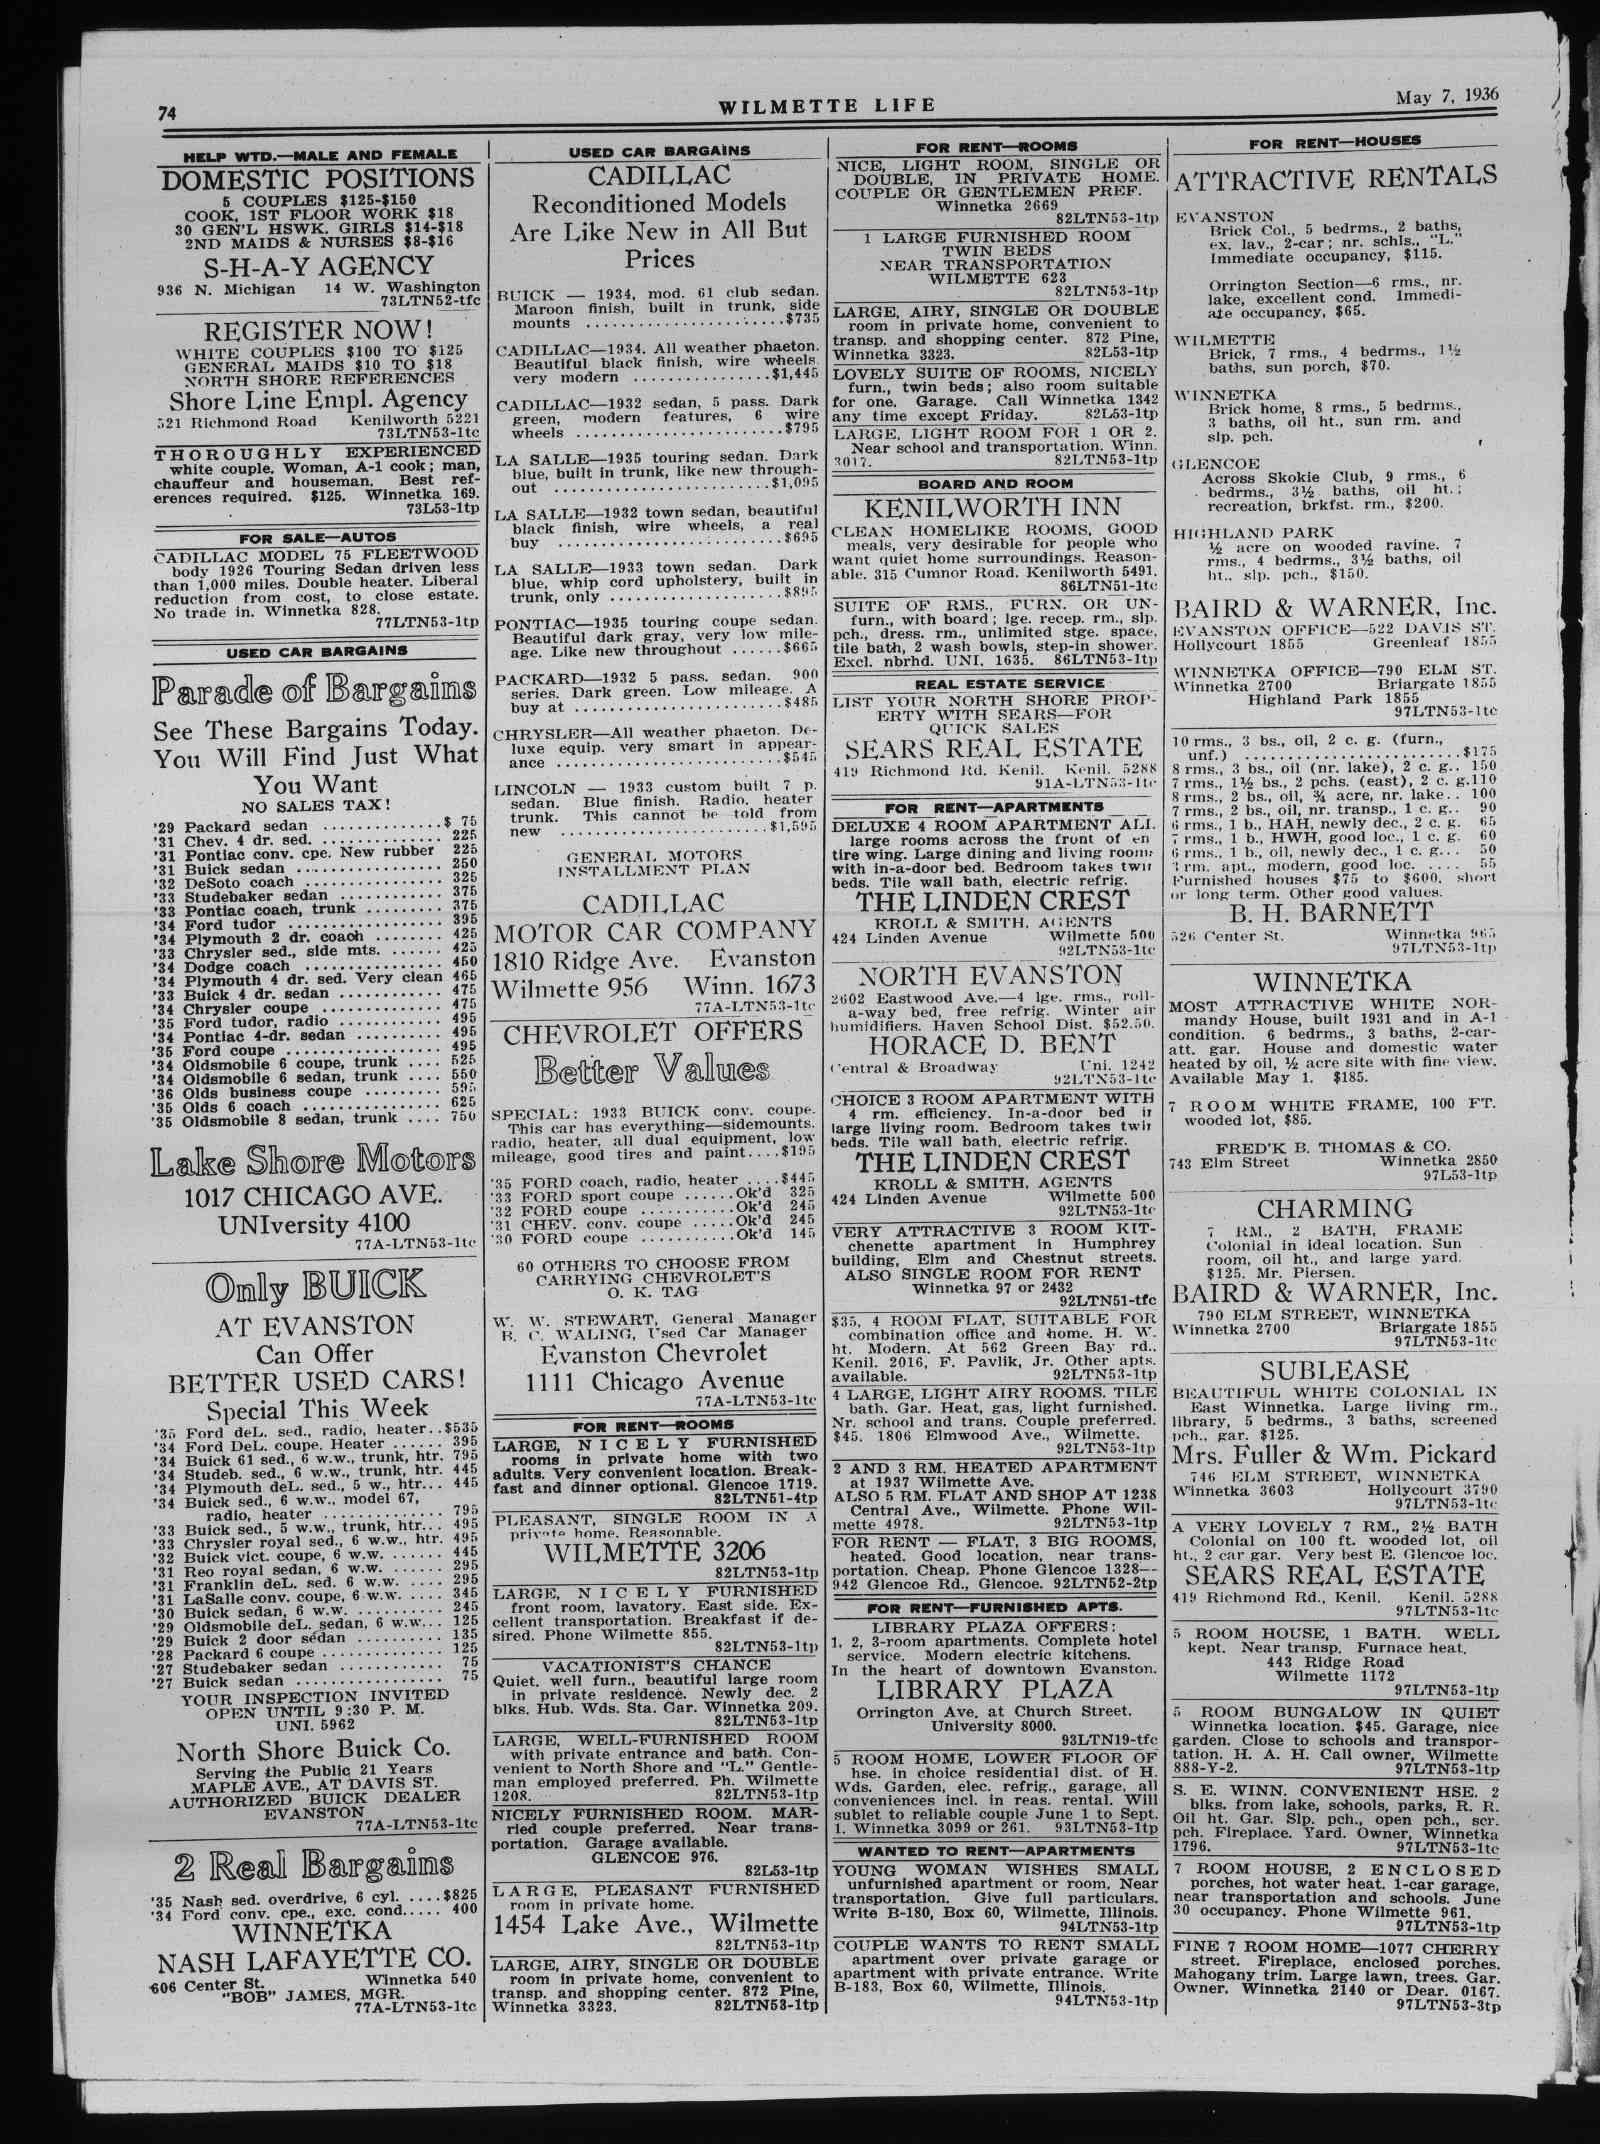 Wilmette Life (Wilmette, Illinois), 7 May 1936